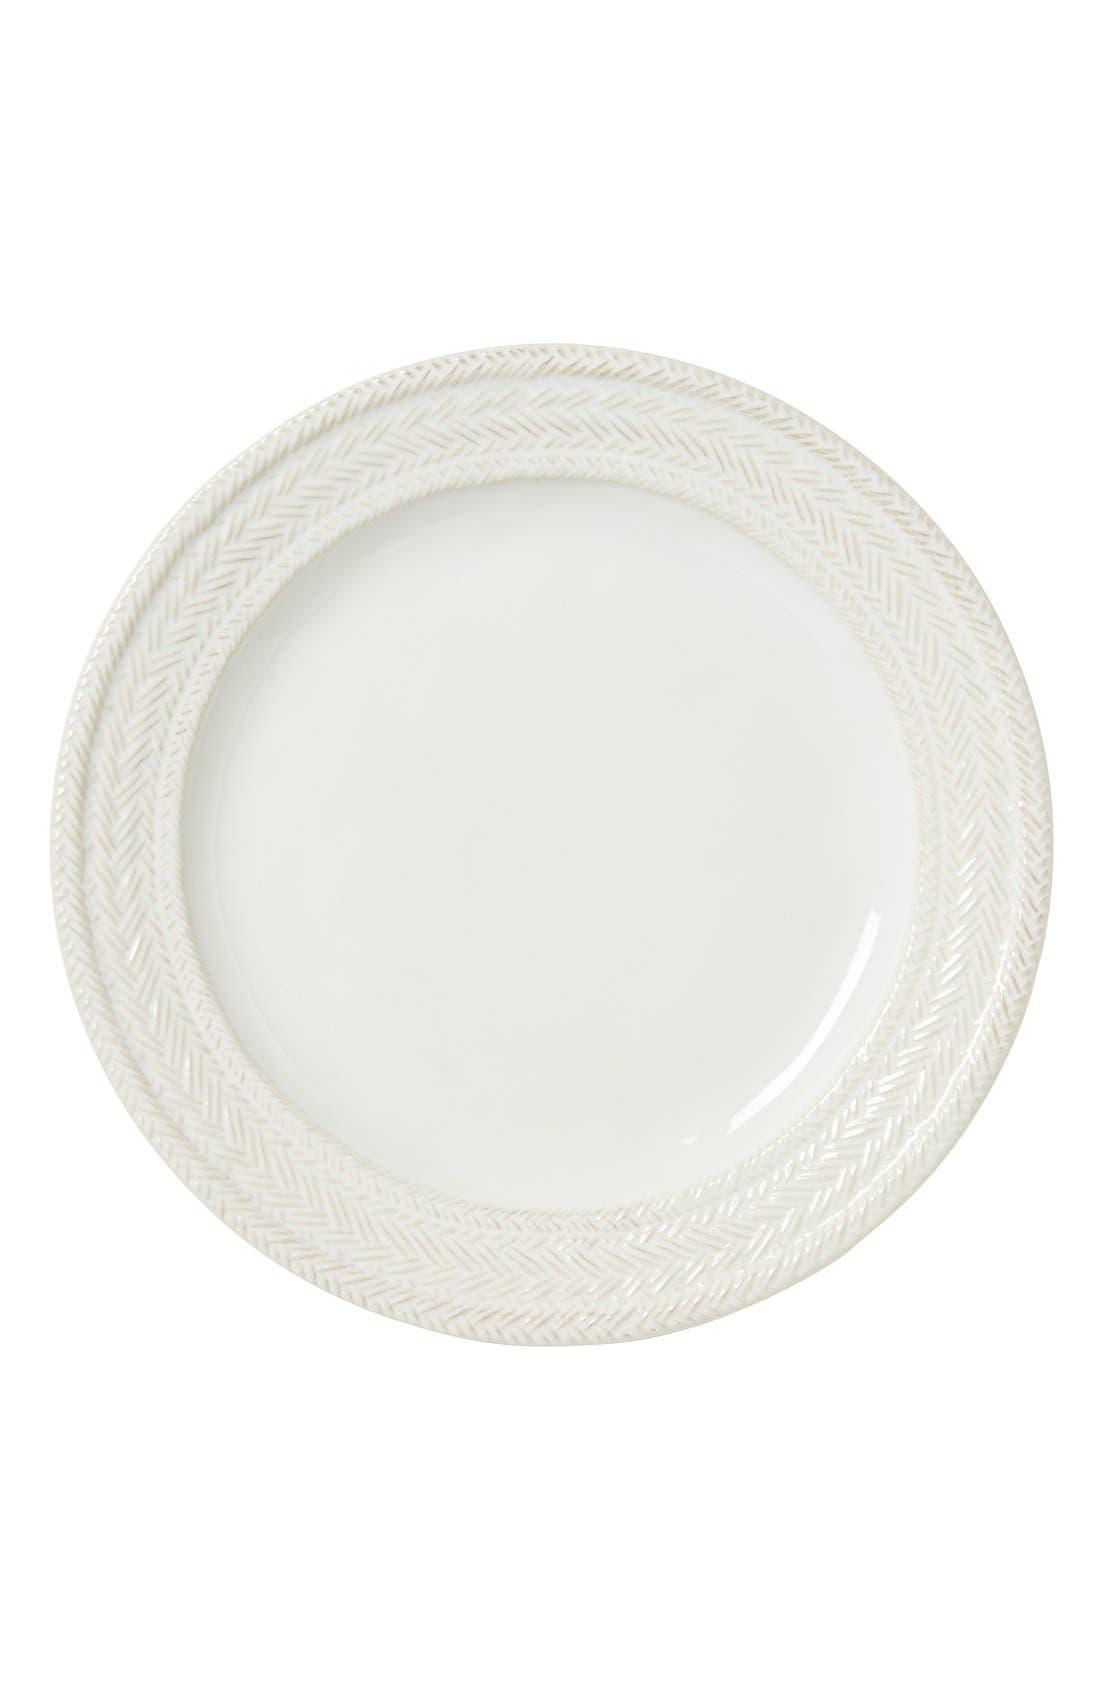 Le Panier Dinner Plate,                         Main,                         color, WHITEWASH